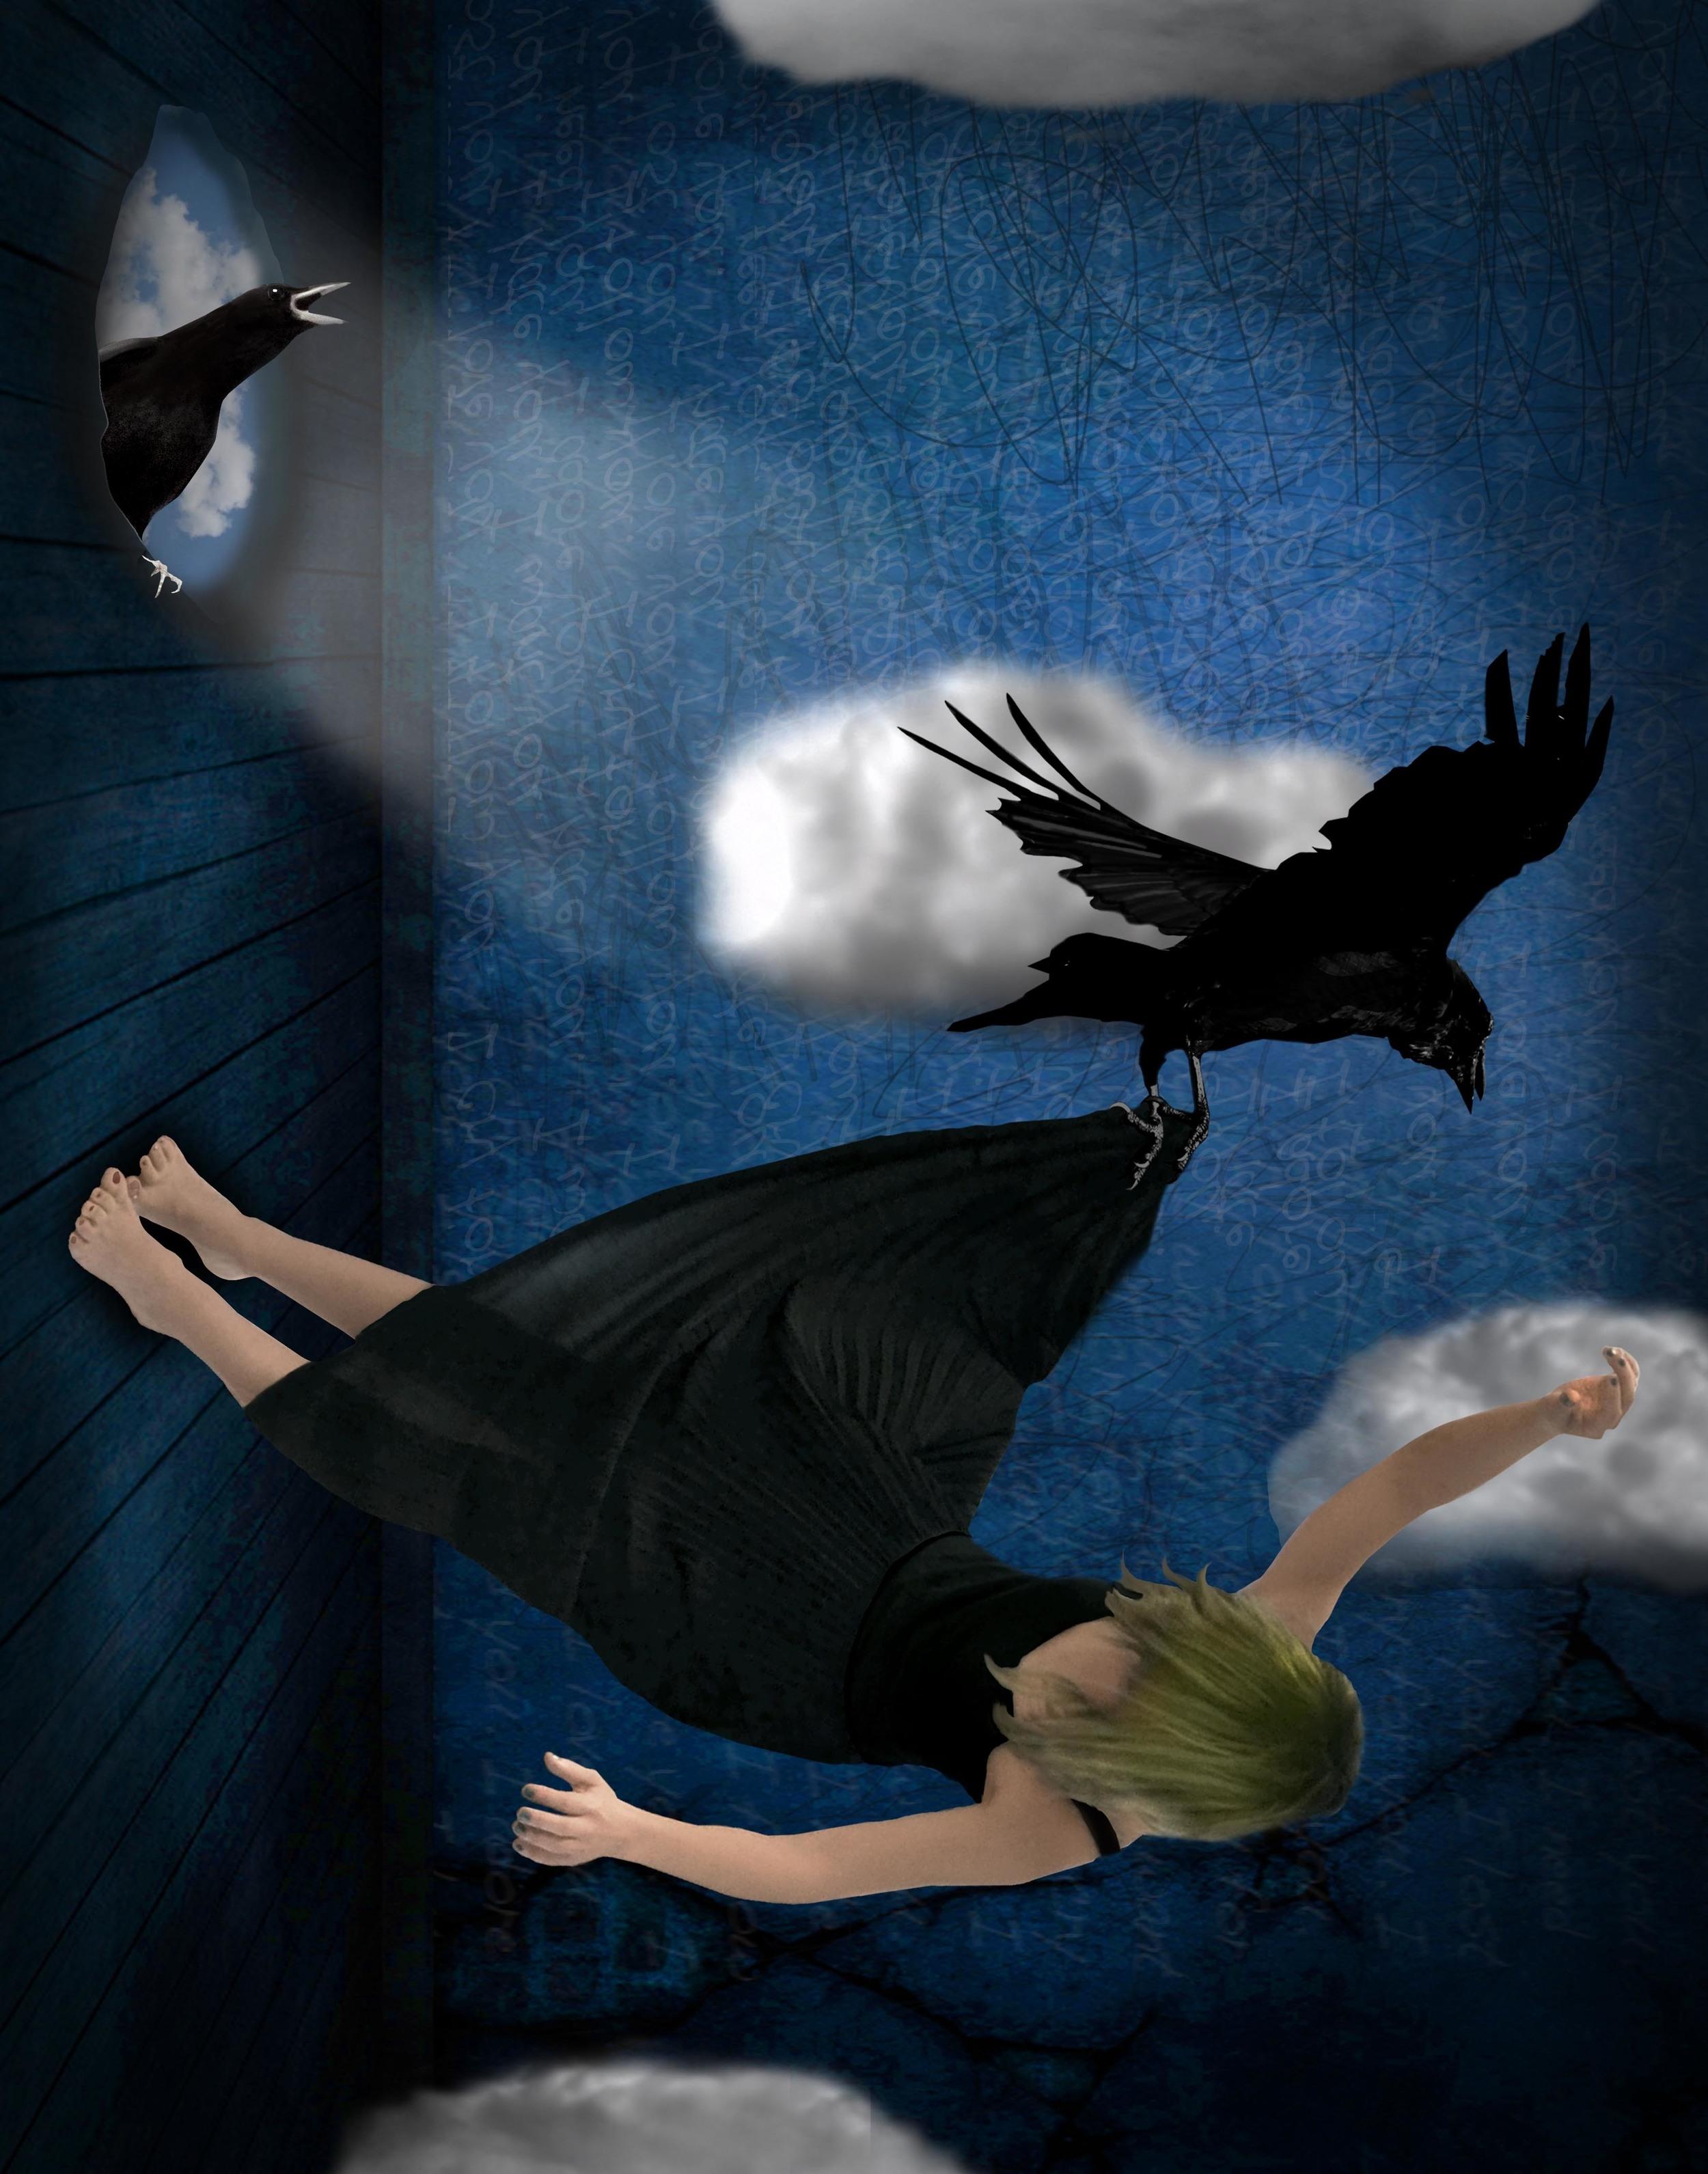 """The Crow Knows Where All the Little Children Go"" by Maria Pabico LaRotonda"